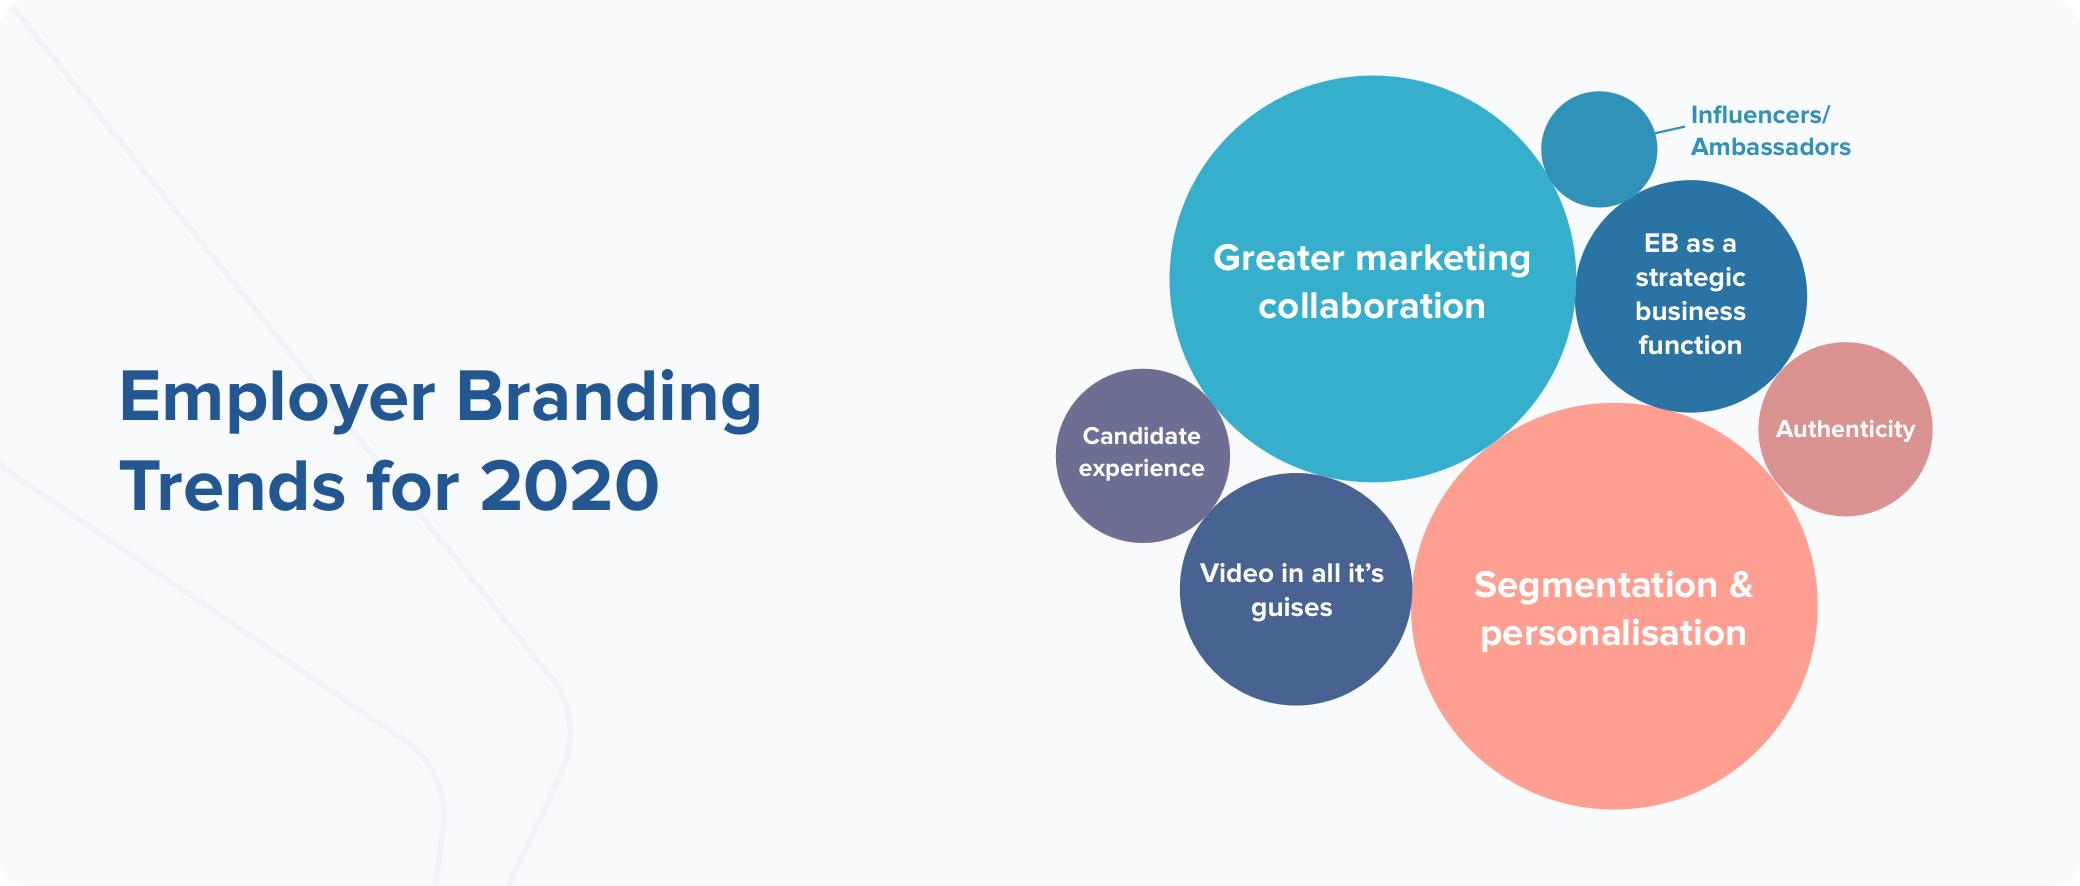 2020 Employer Branding Trends